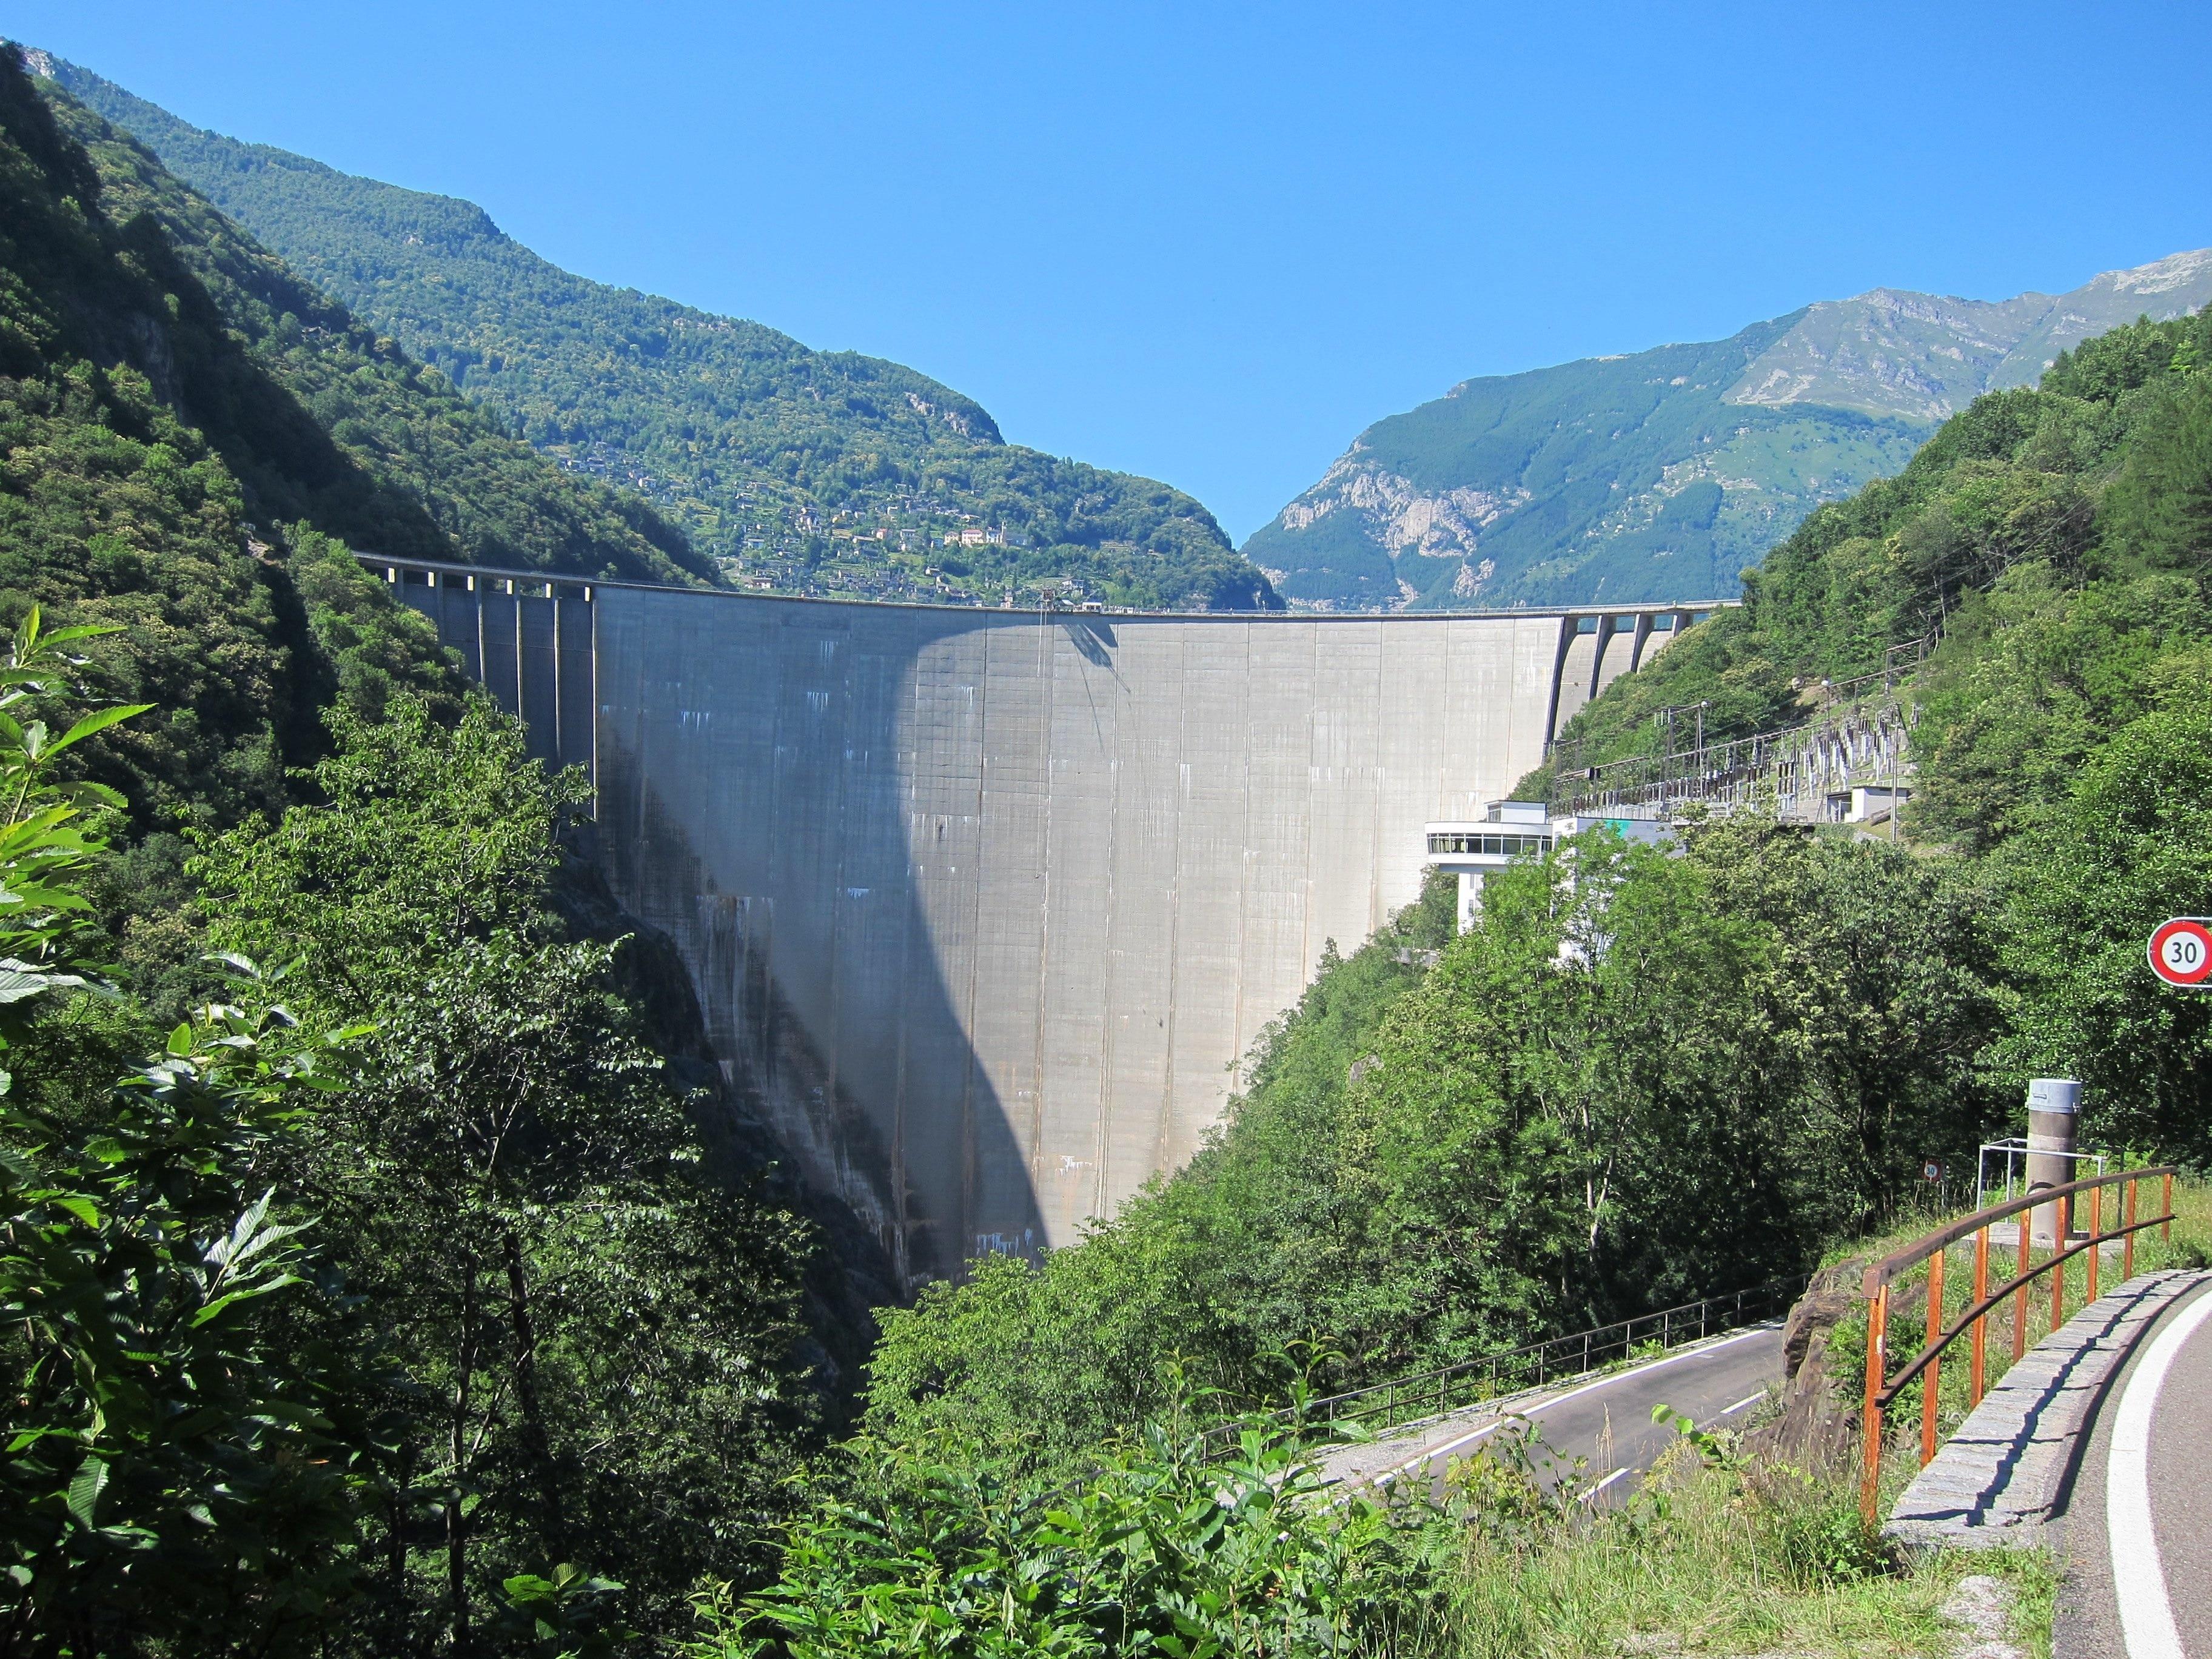 Gordola, Canton of Ticino, Switzerland